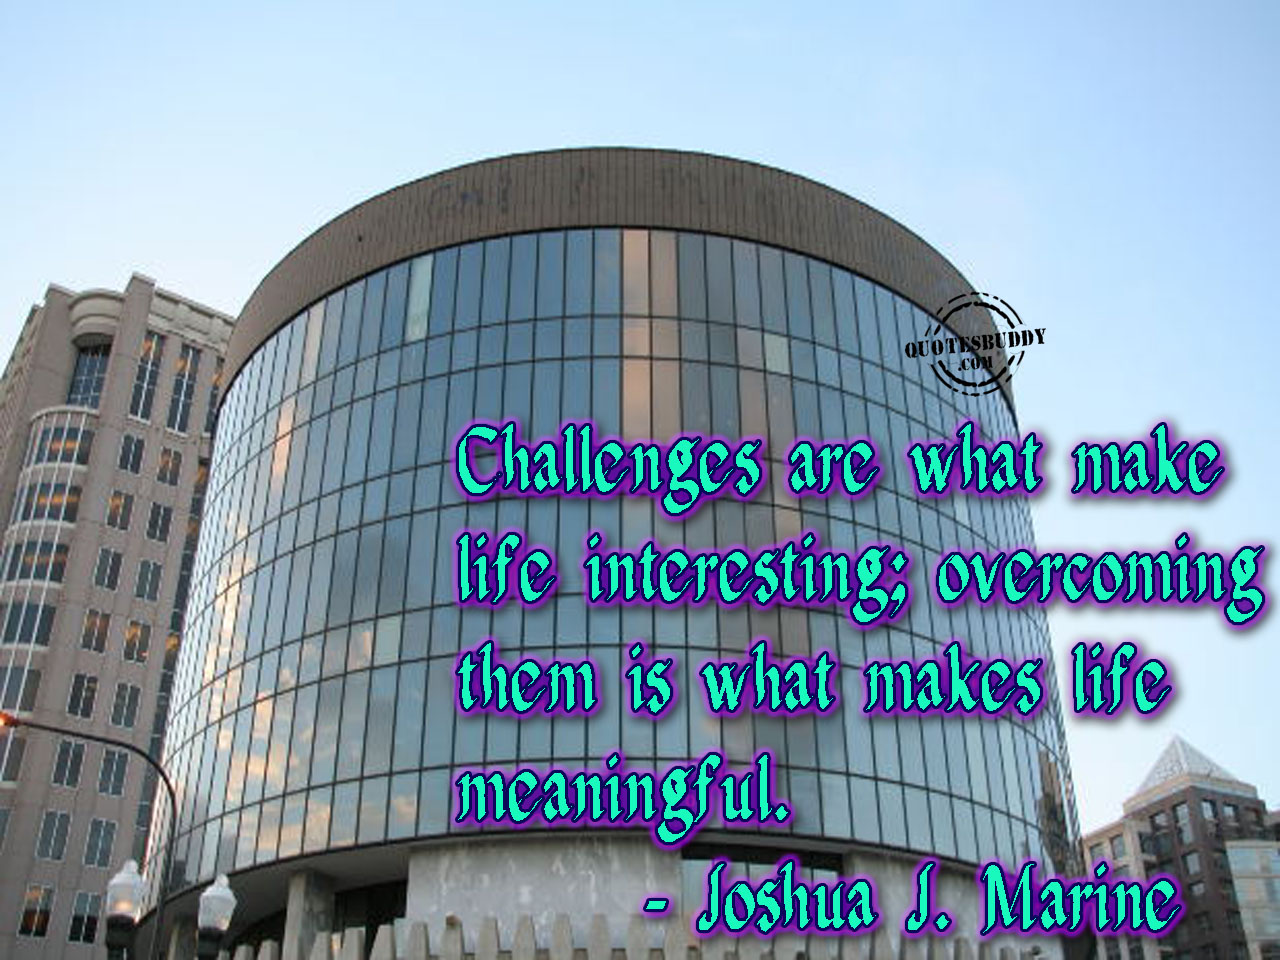 Challenge quote #1